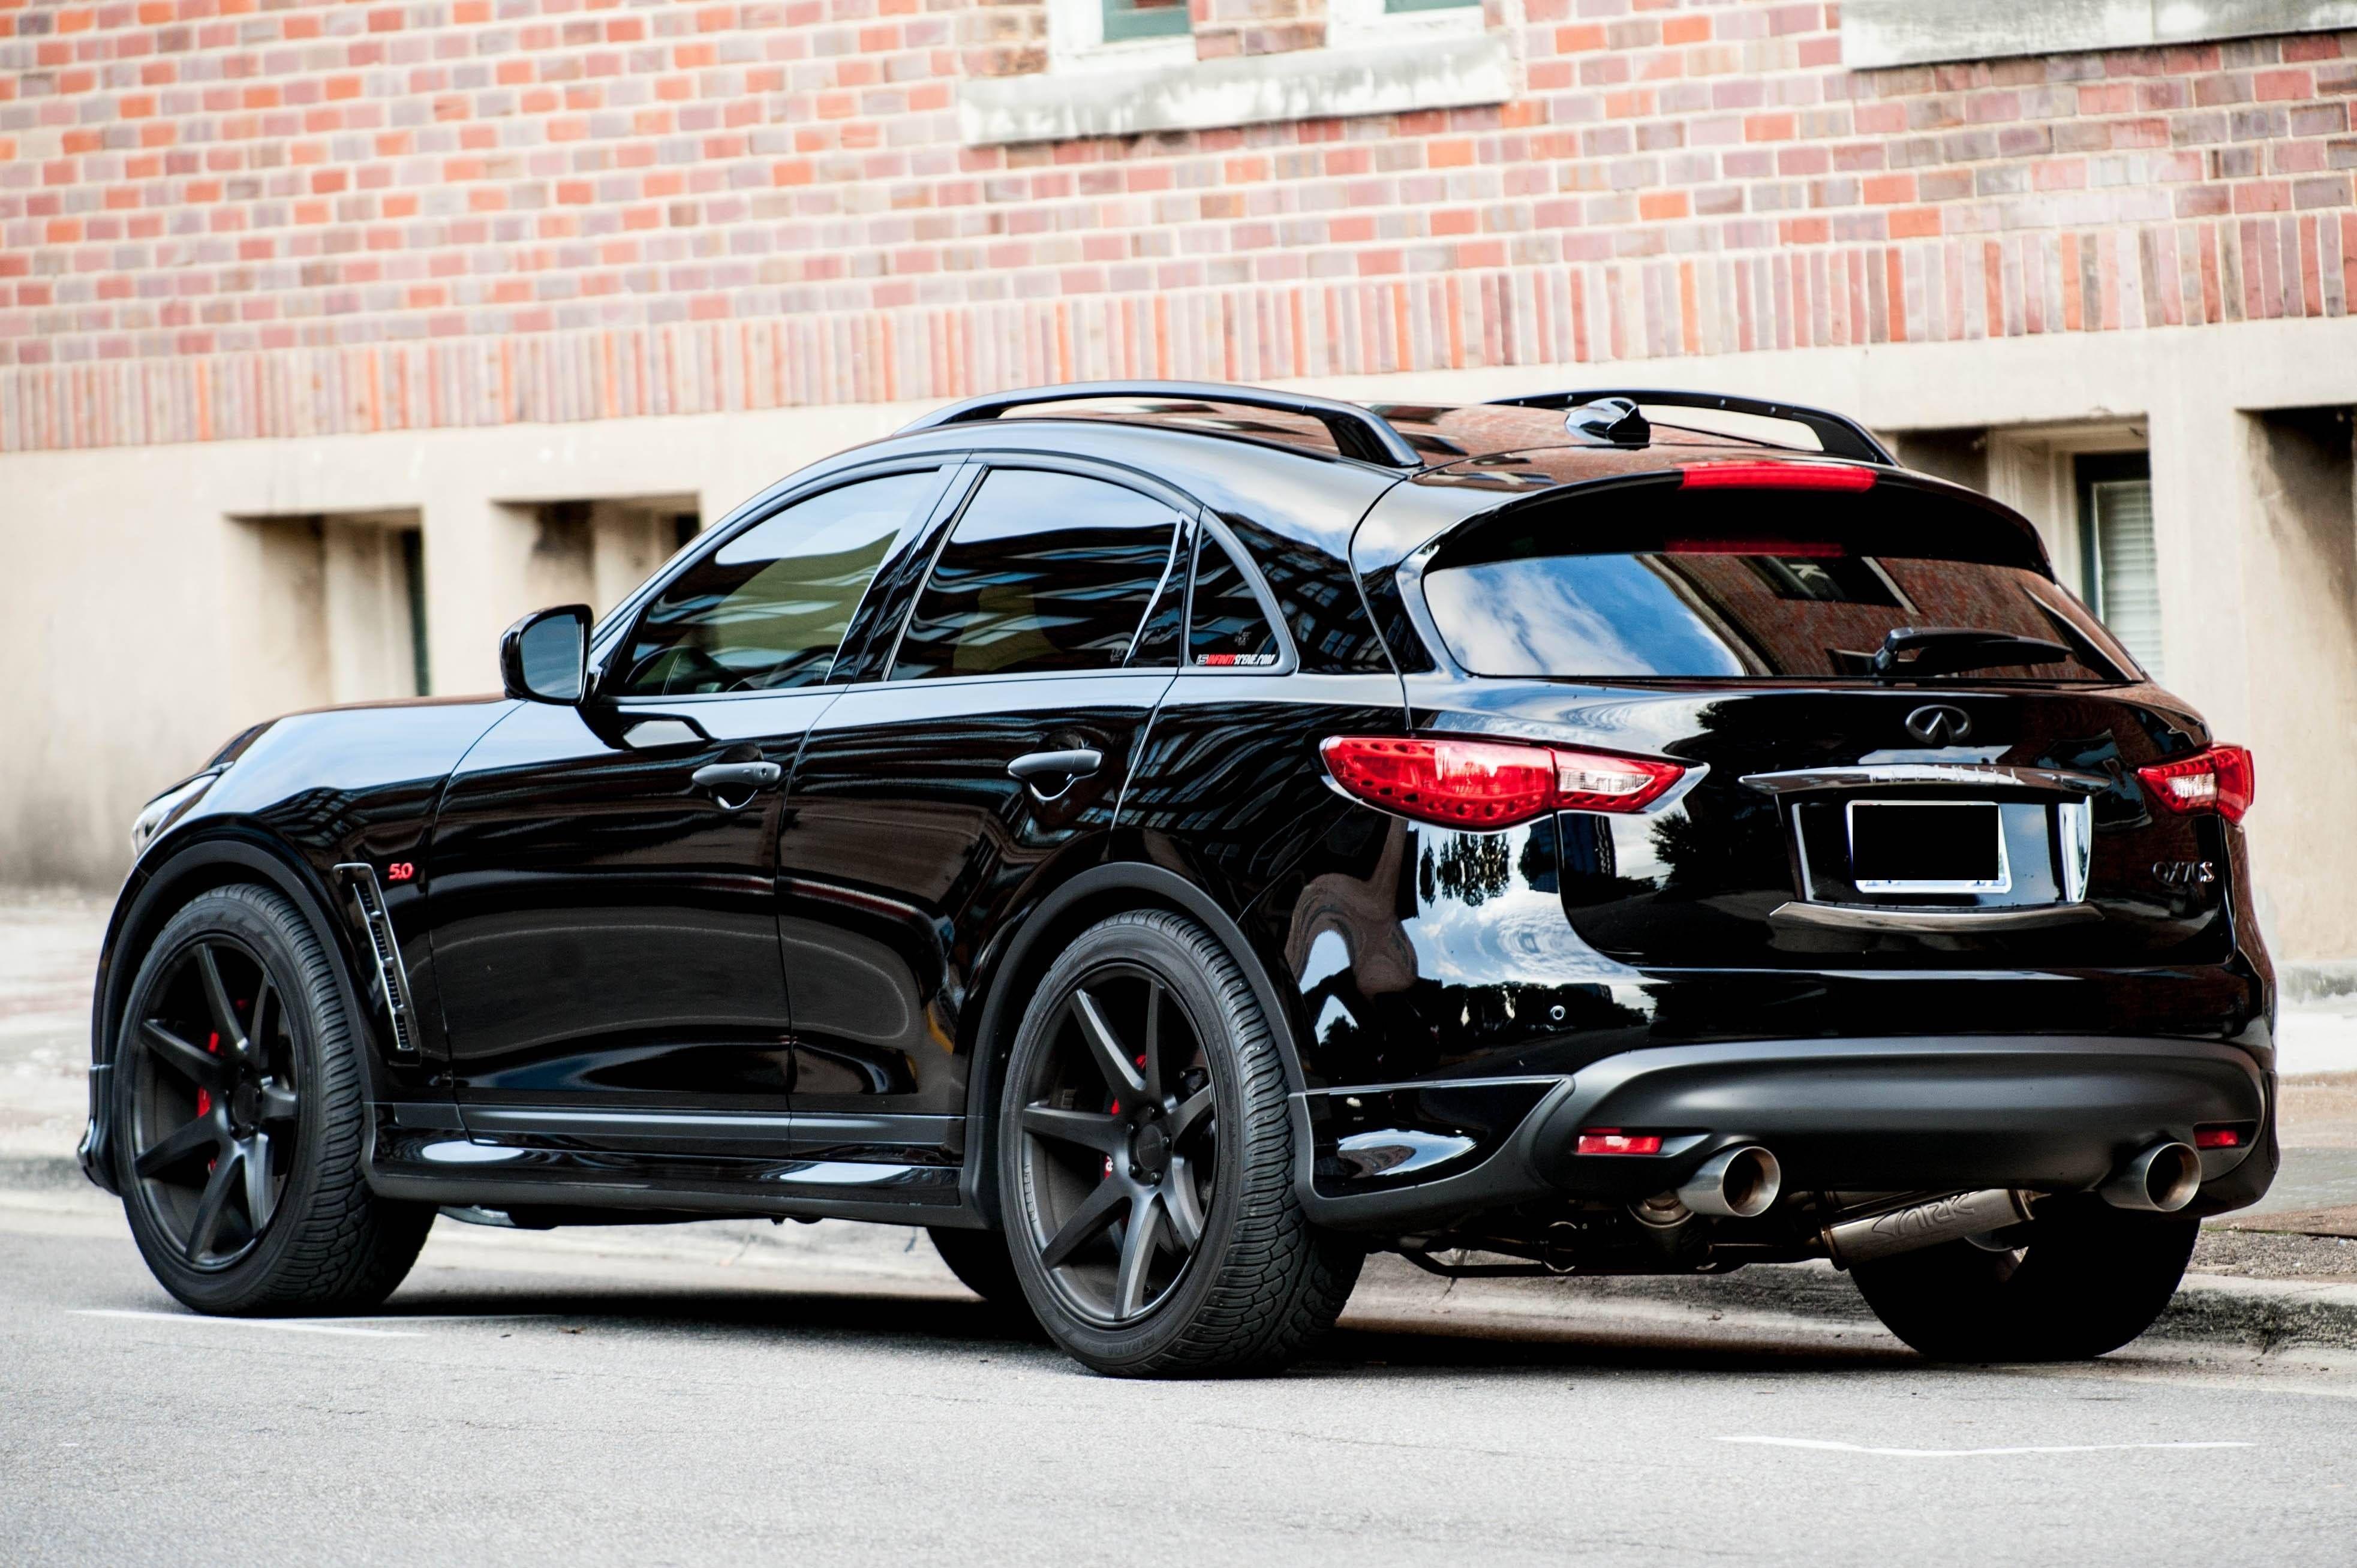 The Beast Infinity suv, Luxury suv, Dream cars